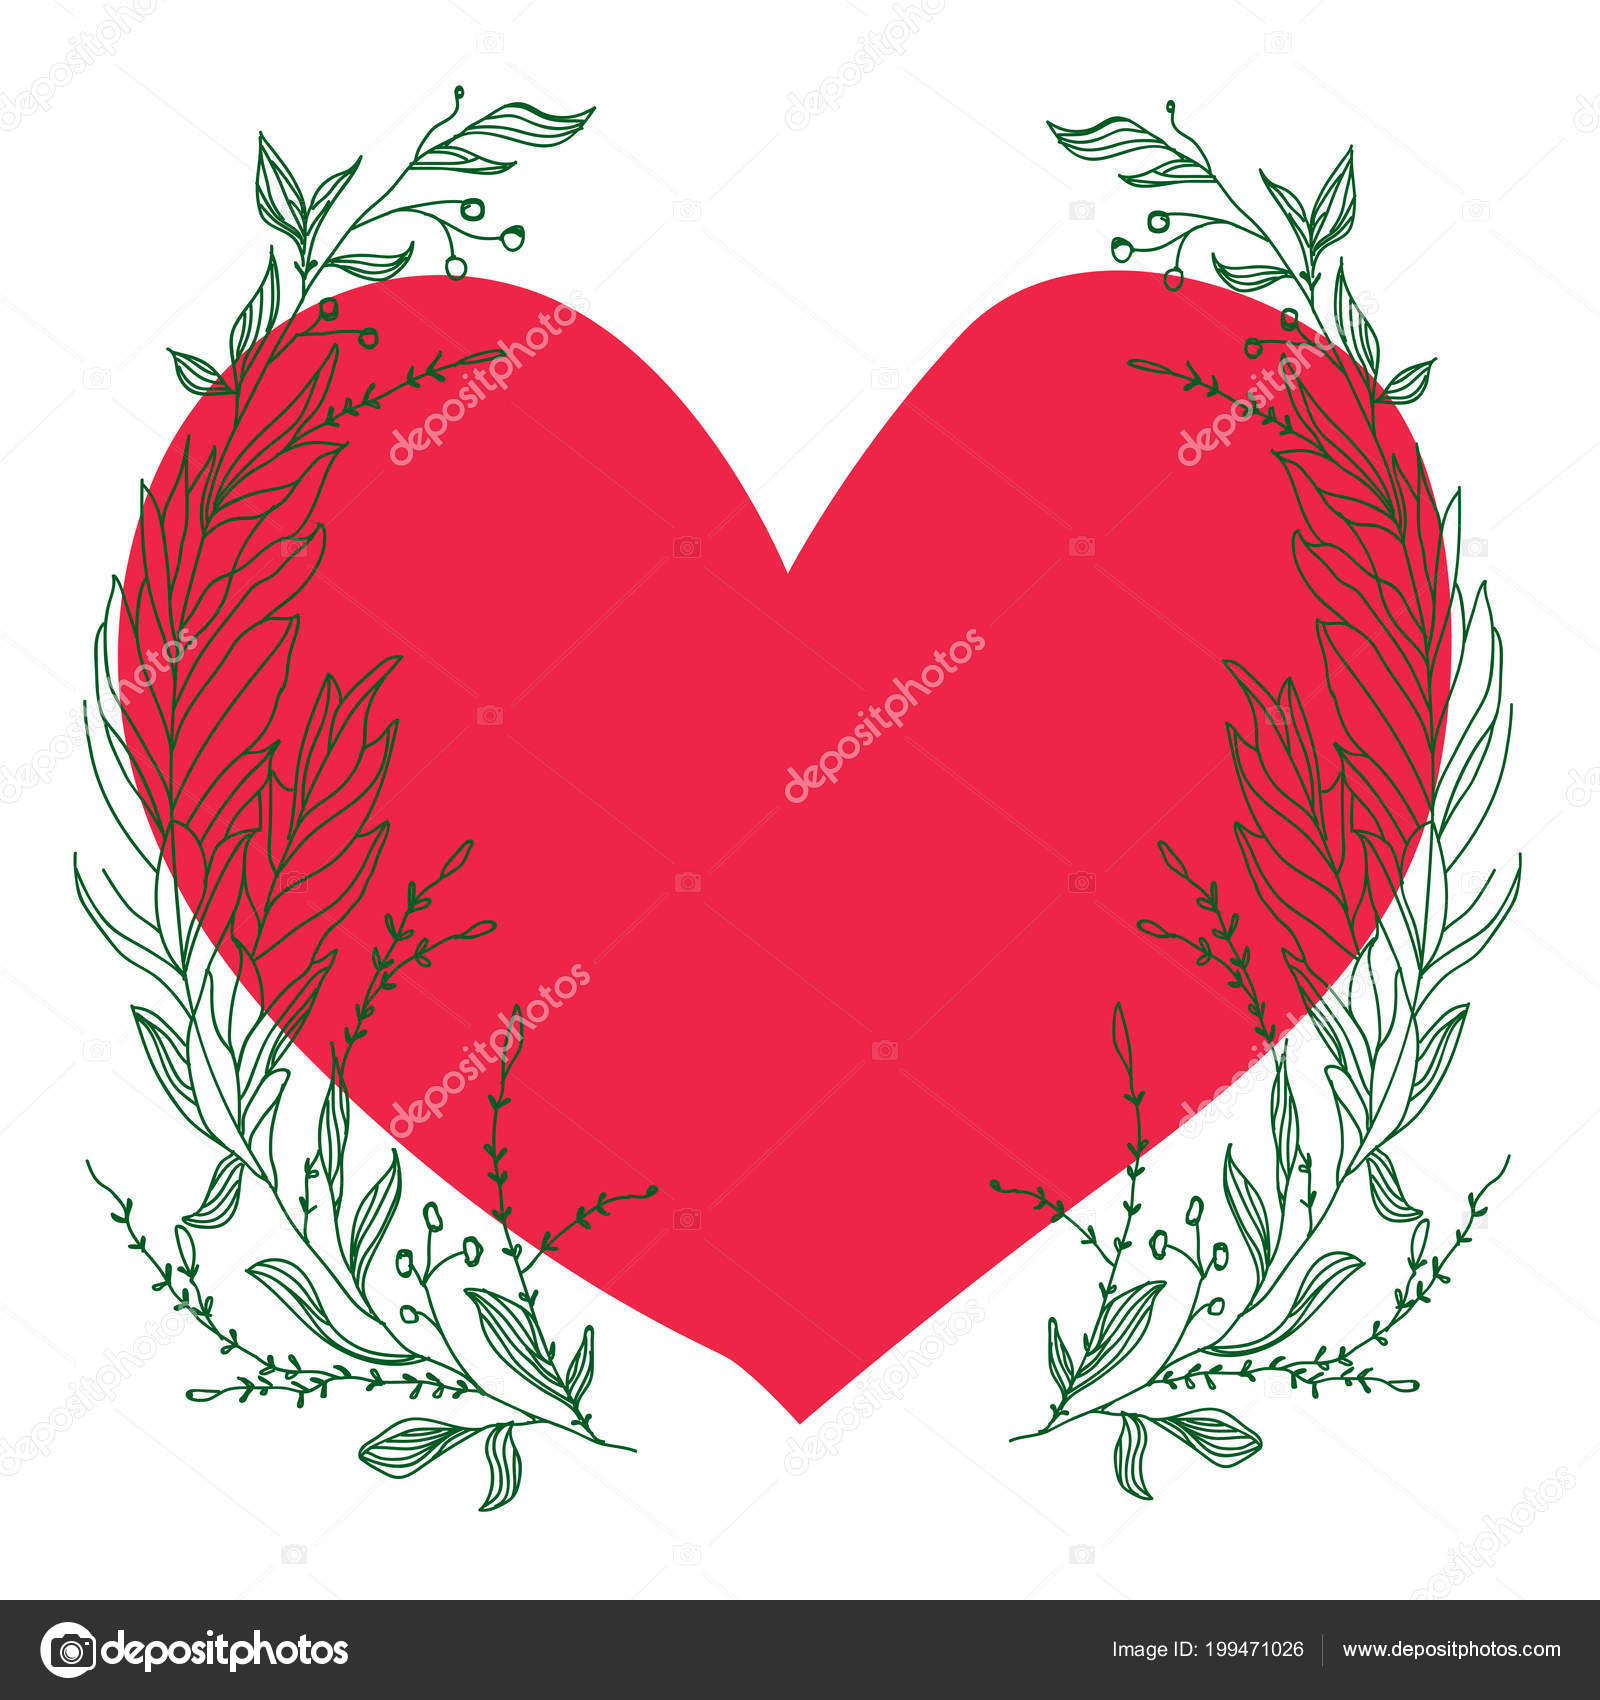 Plantilla Vectores Para Tarjeta Felicitación Composición Con Corazón ...